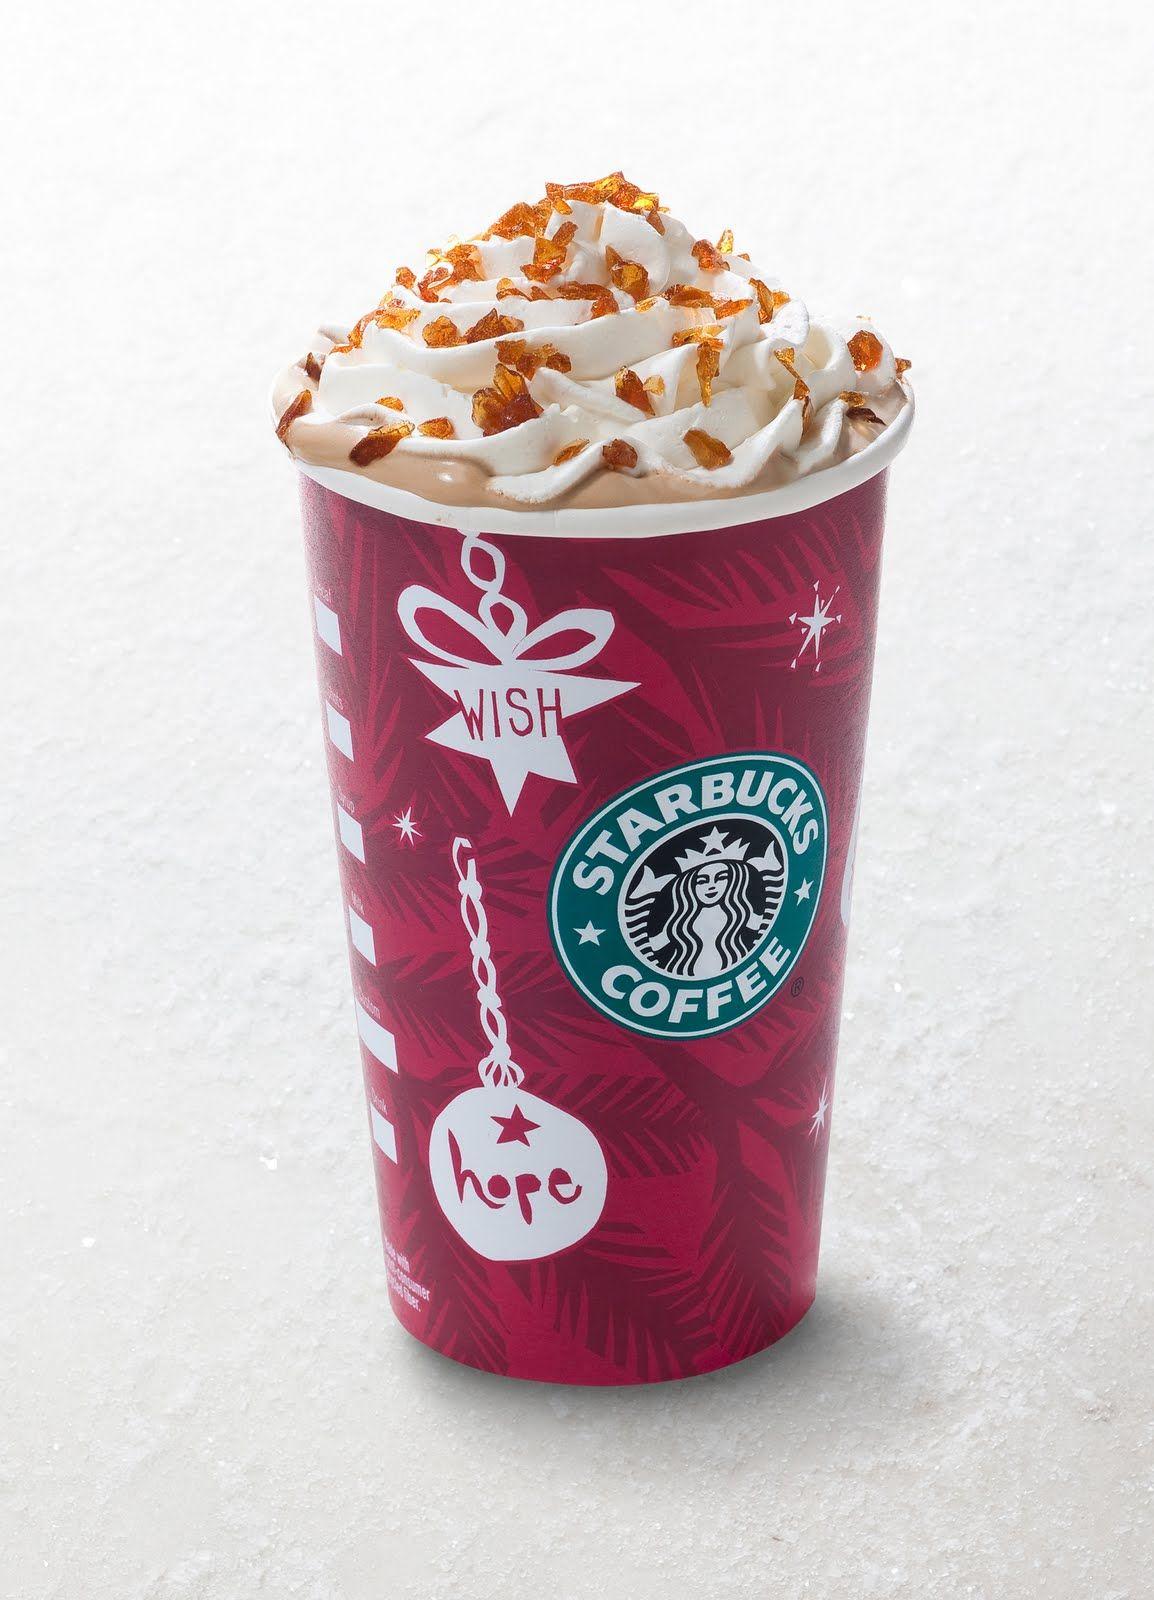 My Special Starbucks Sunday treat today Caramel Brûlée